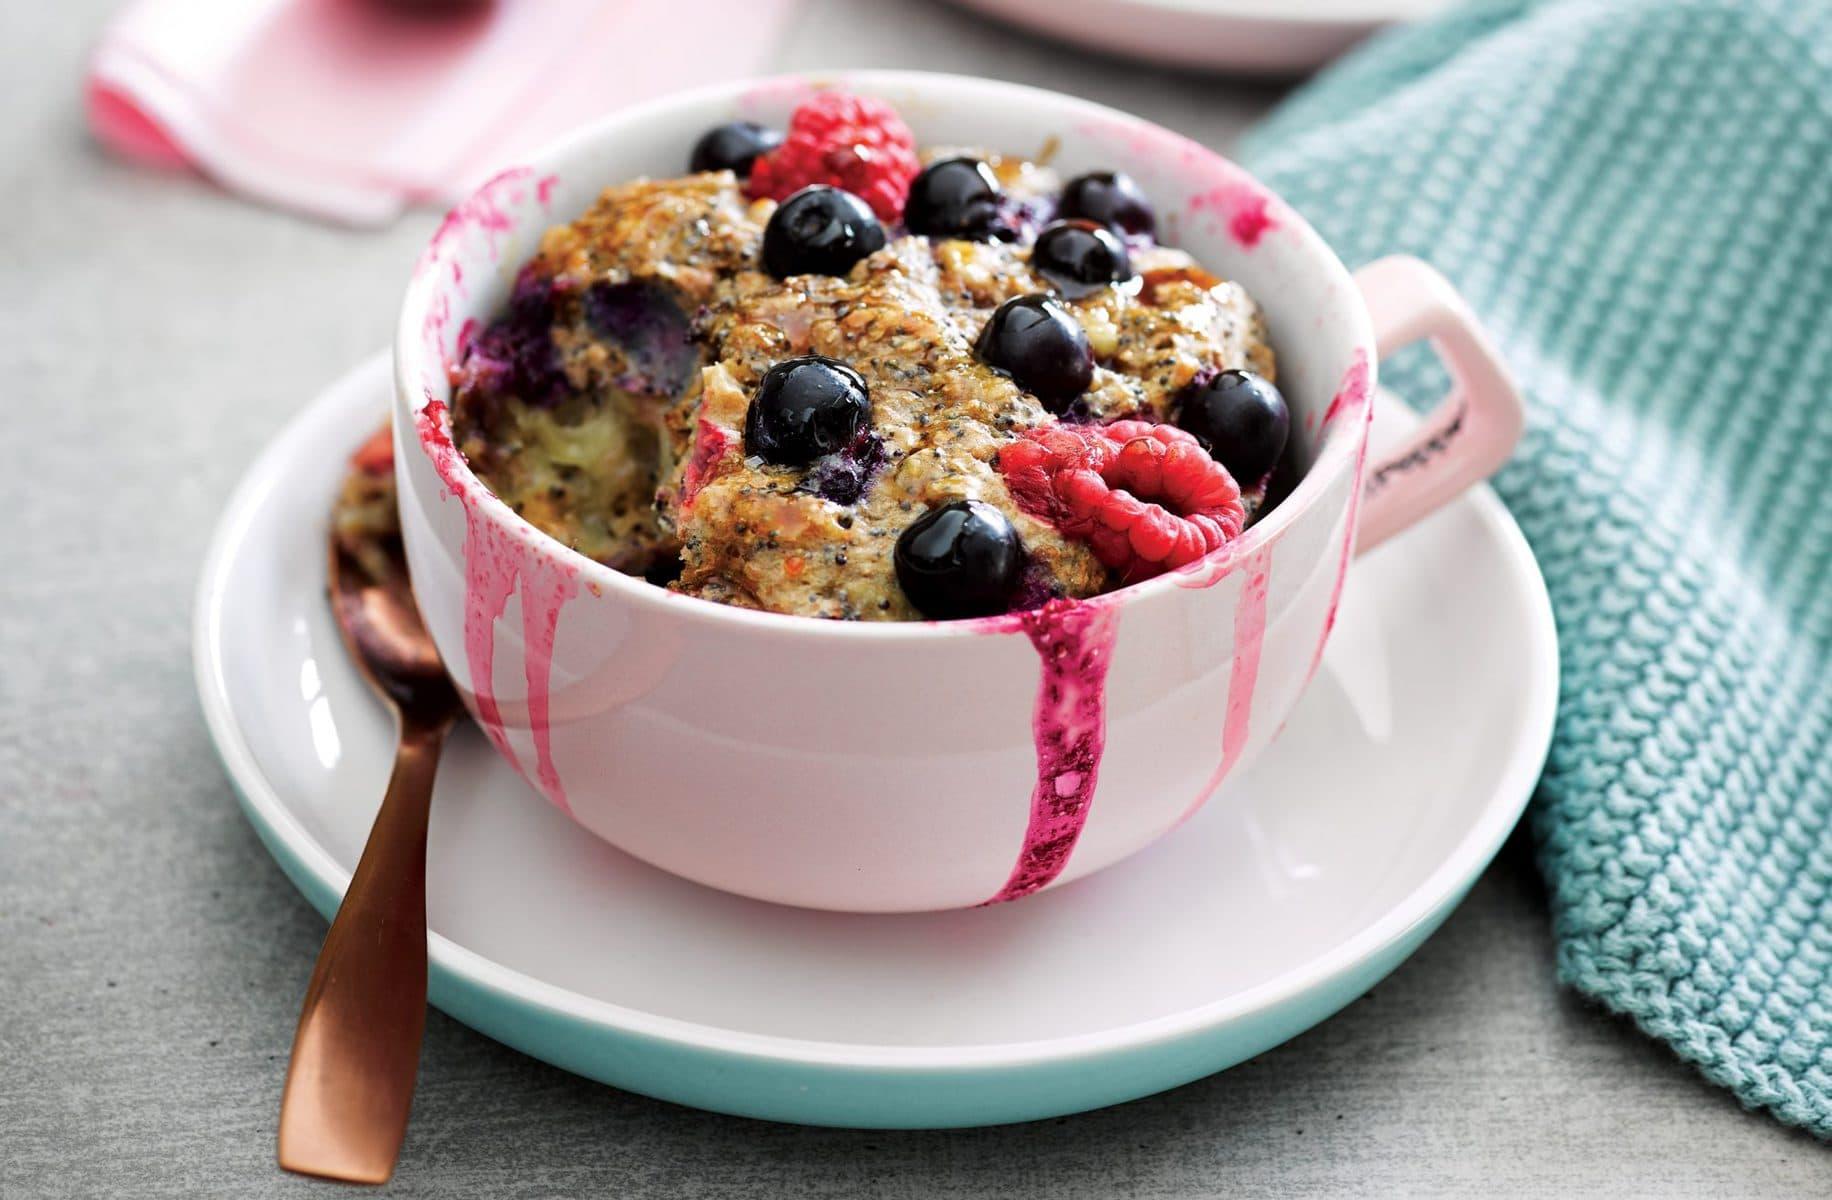 Breakfast muffin in a mug